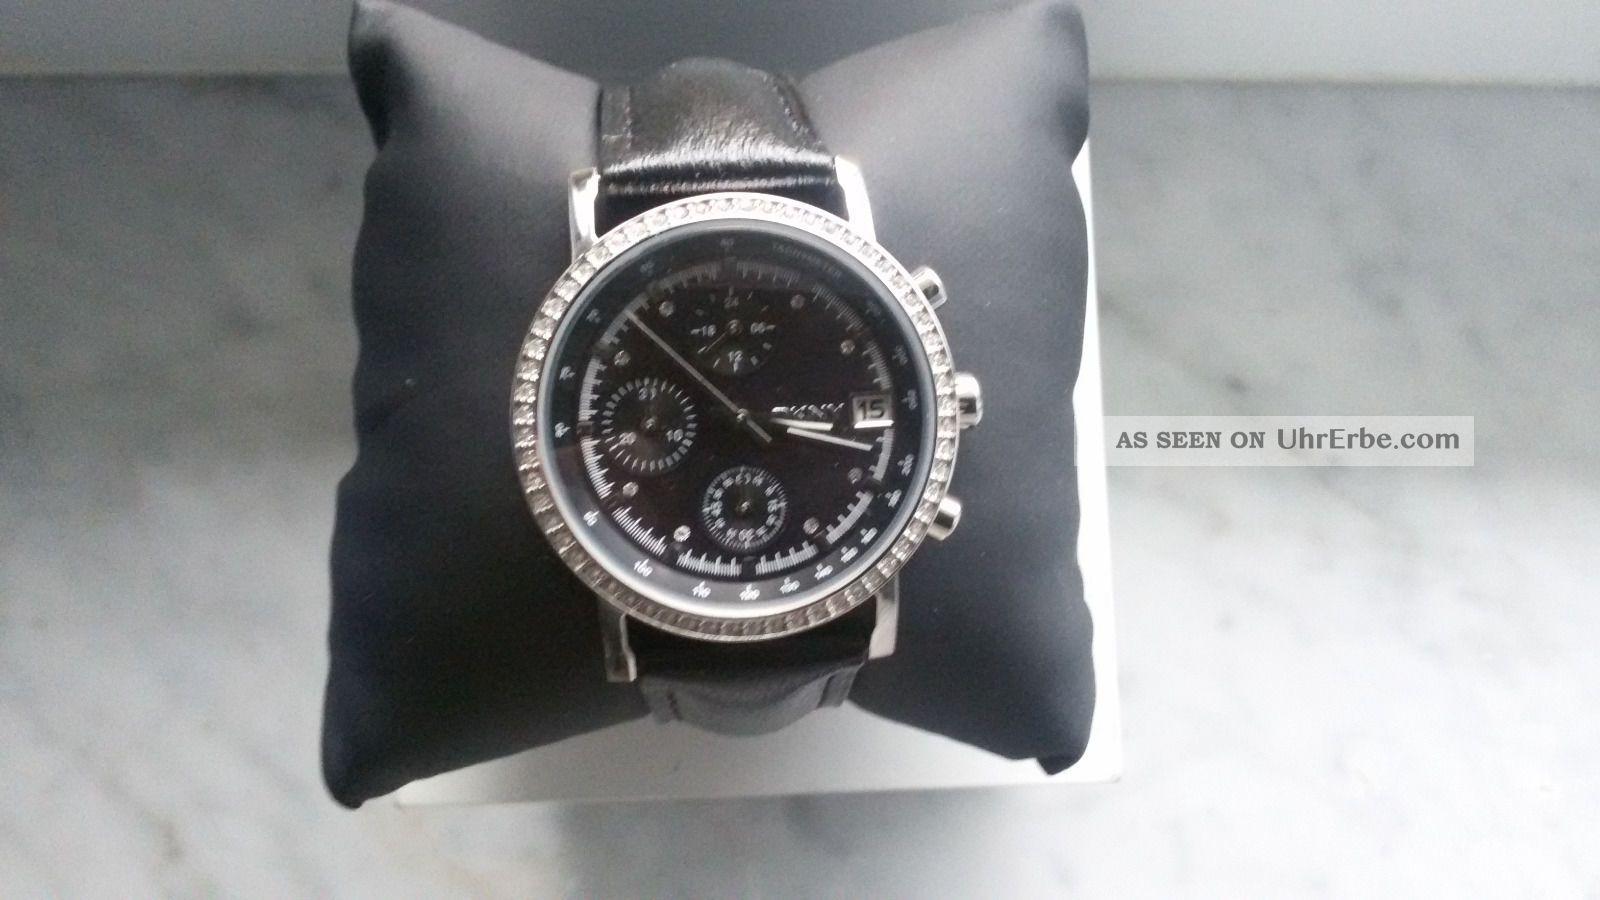 Dkny Armbanduhr Damenuhr Ny - 8365 Strass Silber Armbanduhren Bild